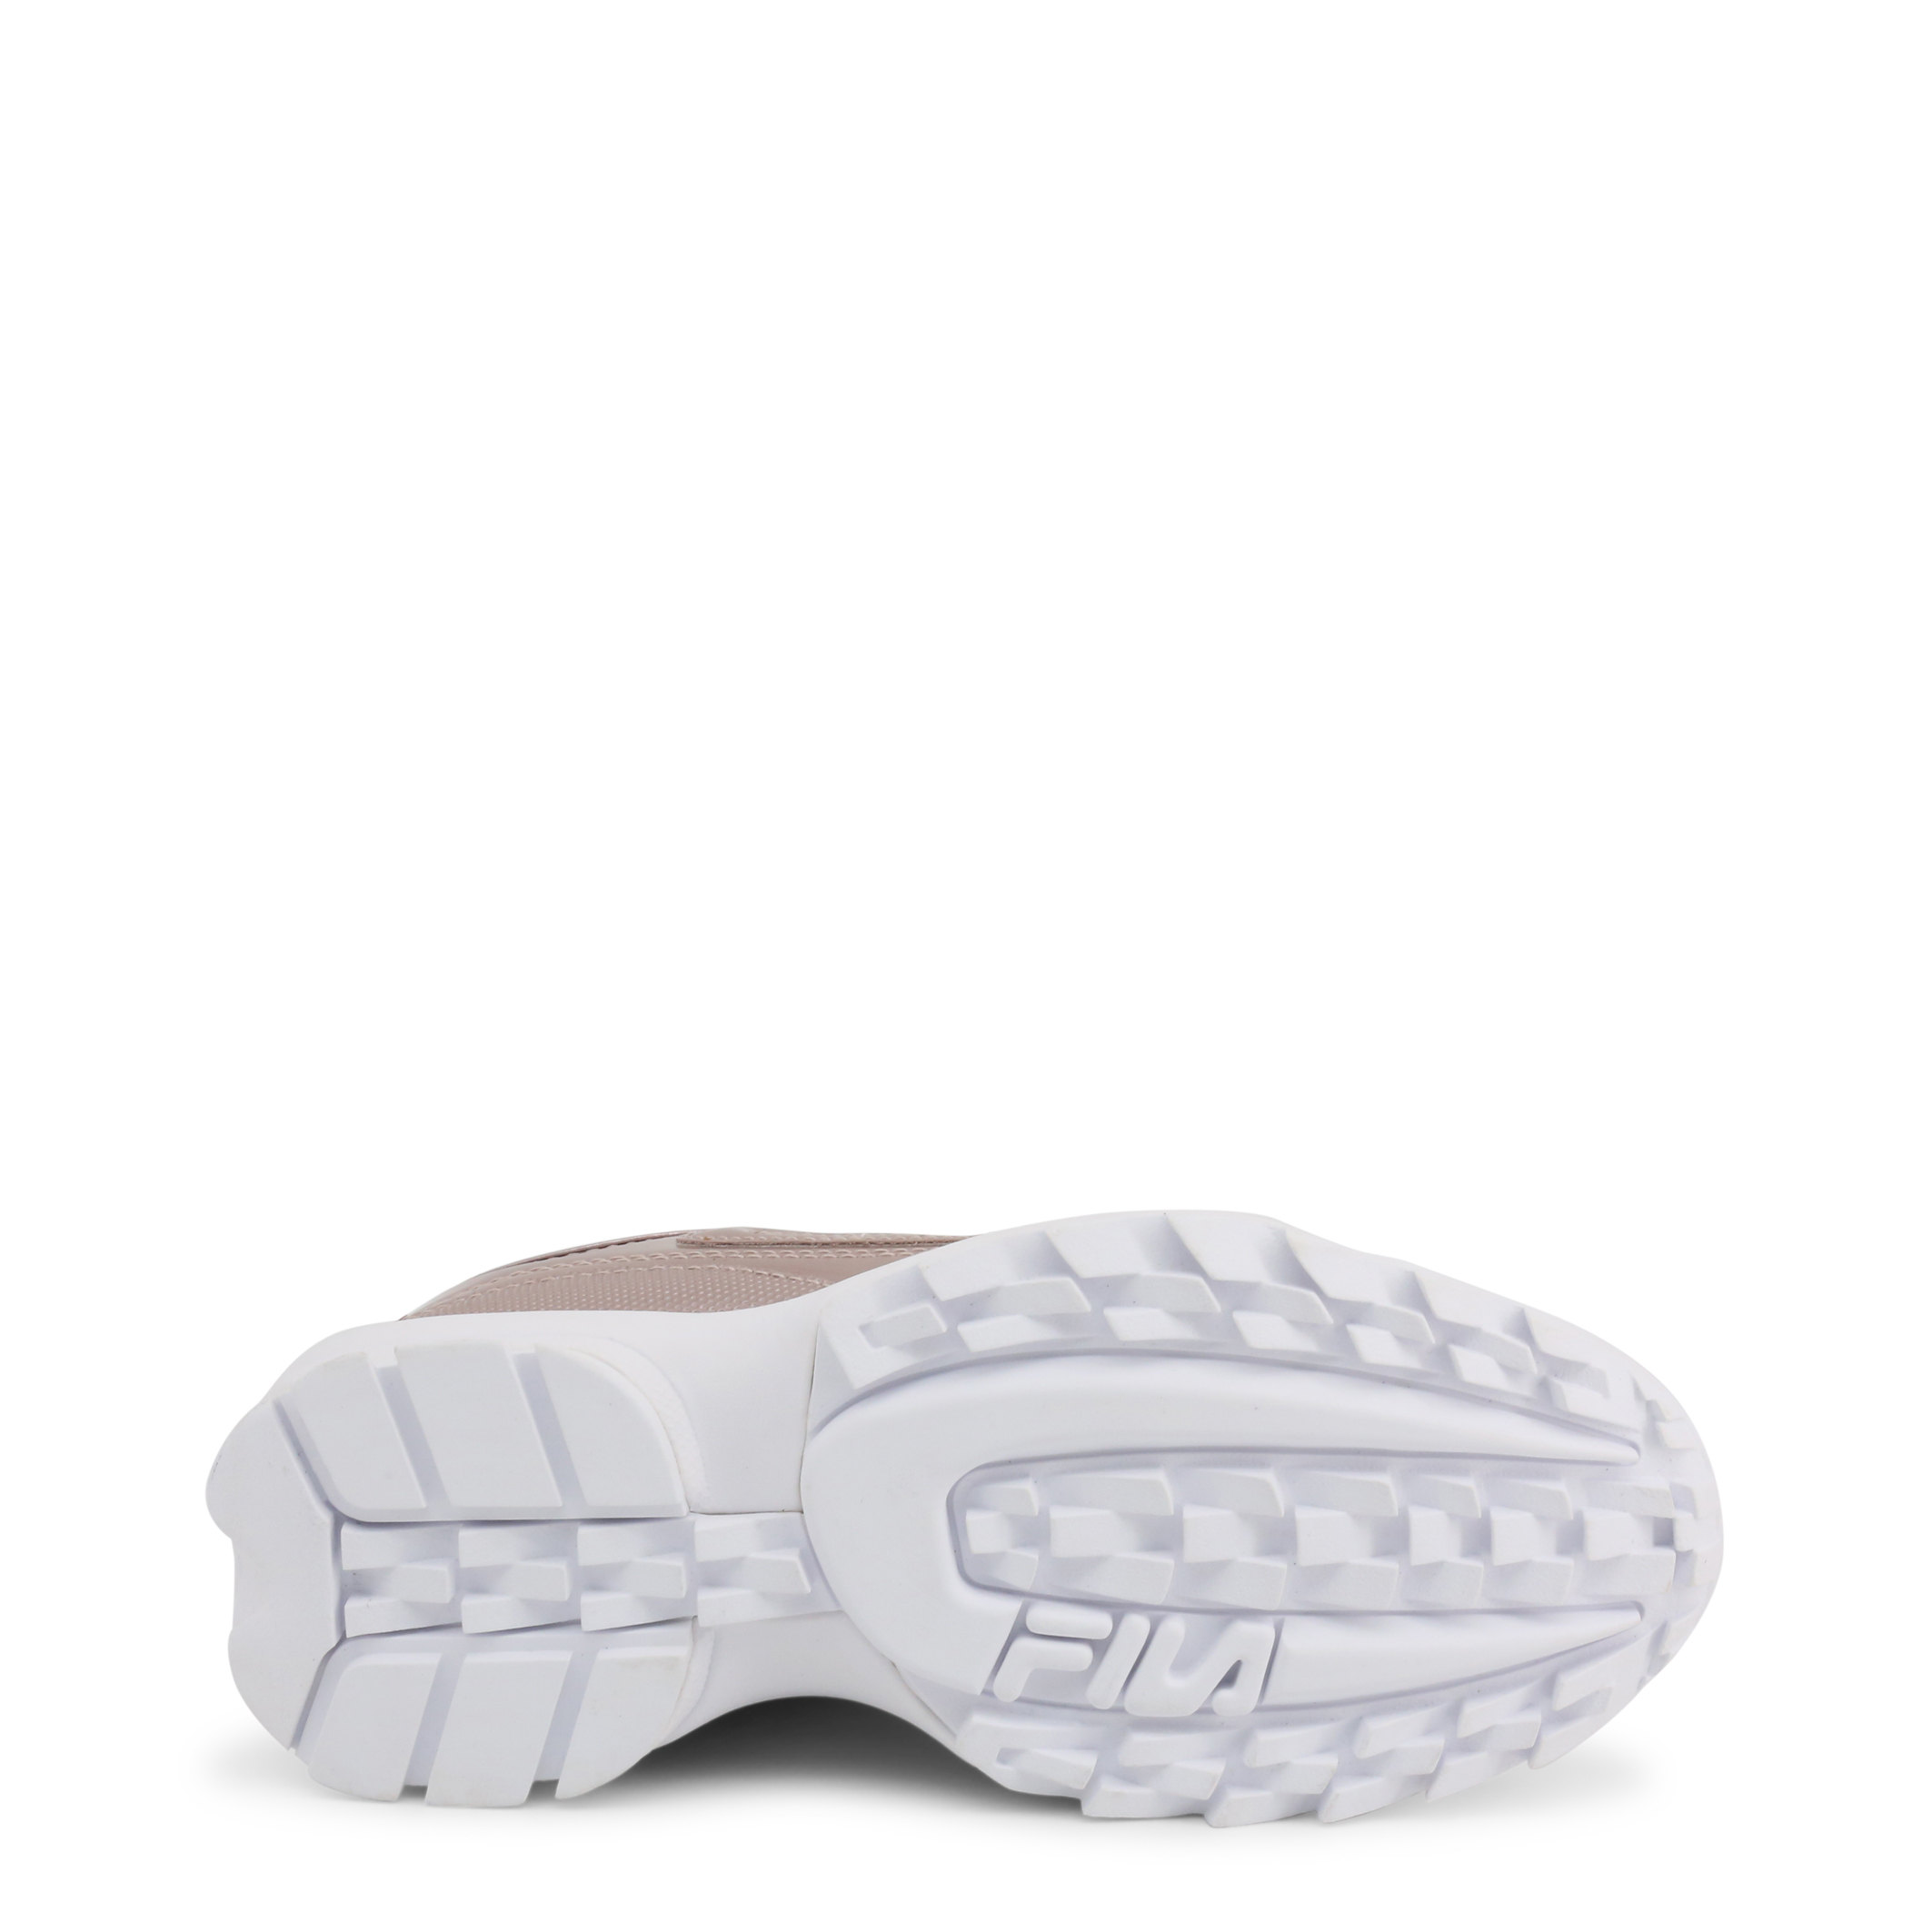 Baskets / Sneakers  Fila DISRUPTOR-M-LOW_1010747 pink